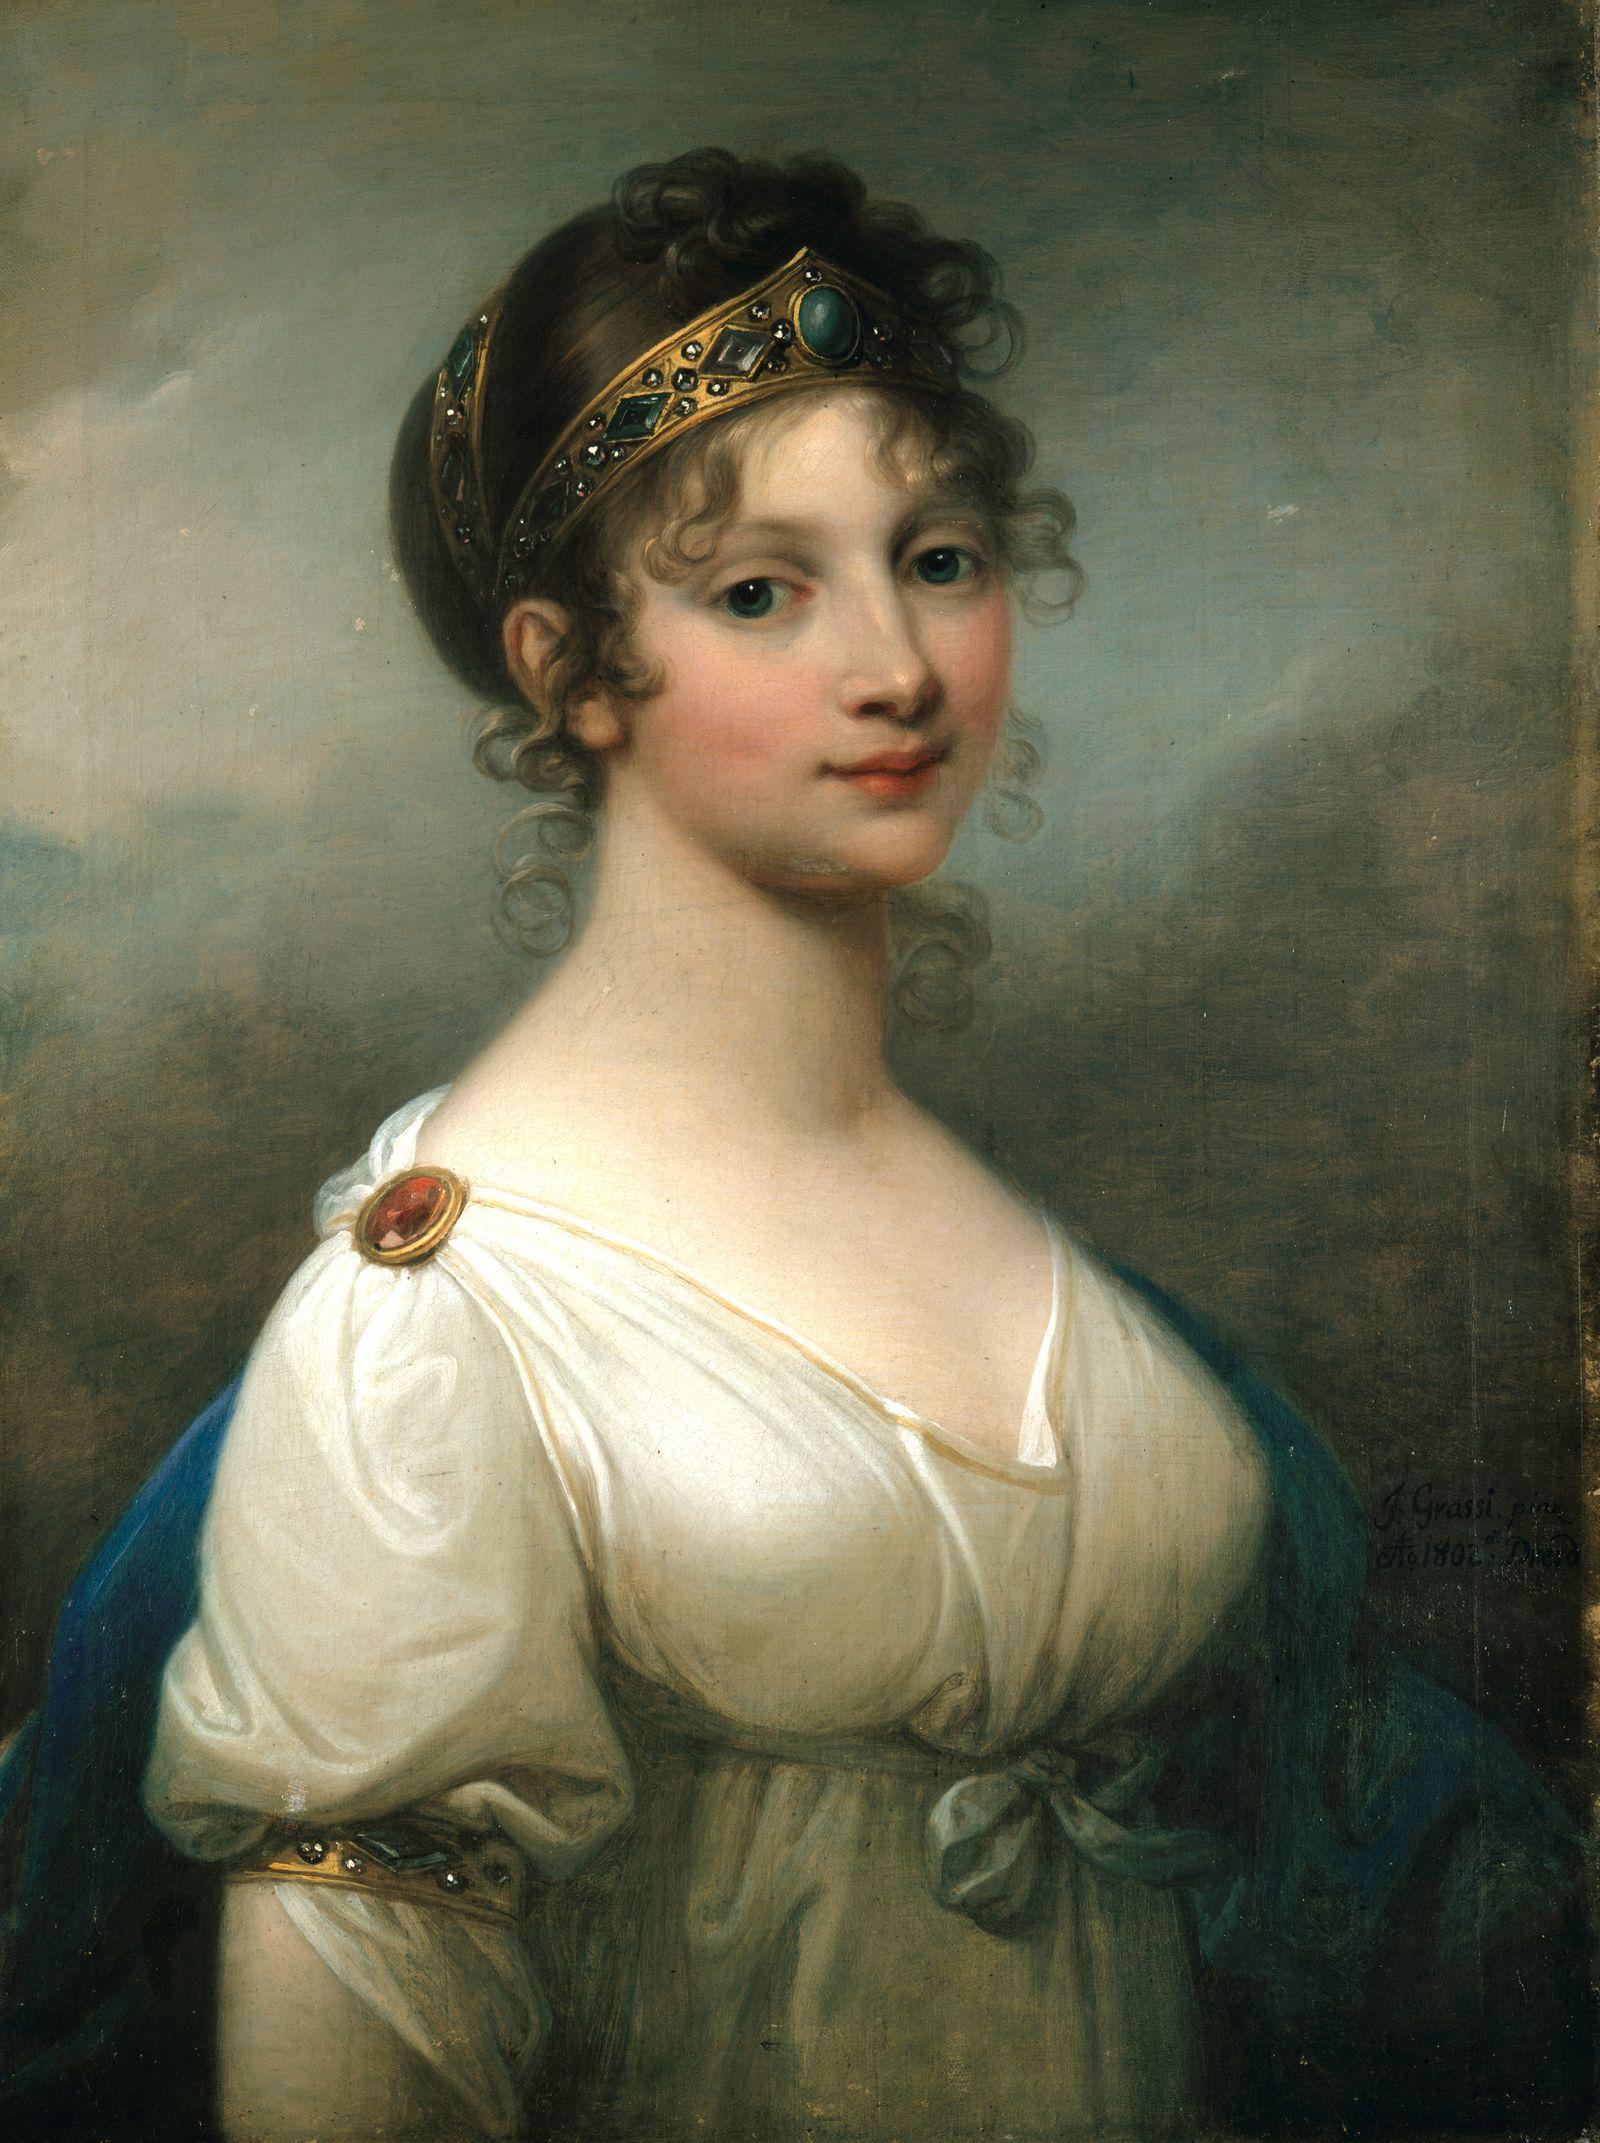 Luise, Kšnigin von Preu§en